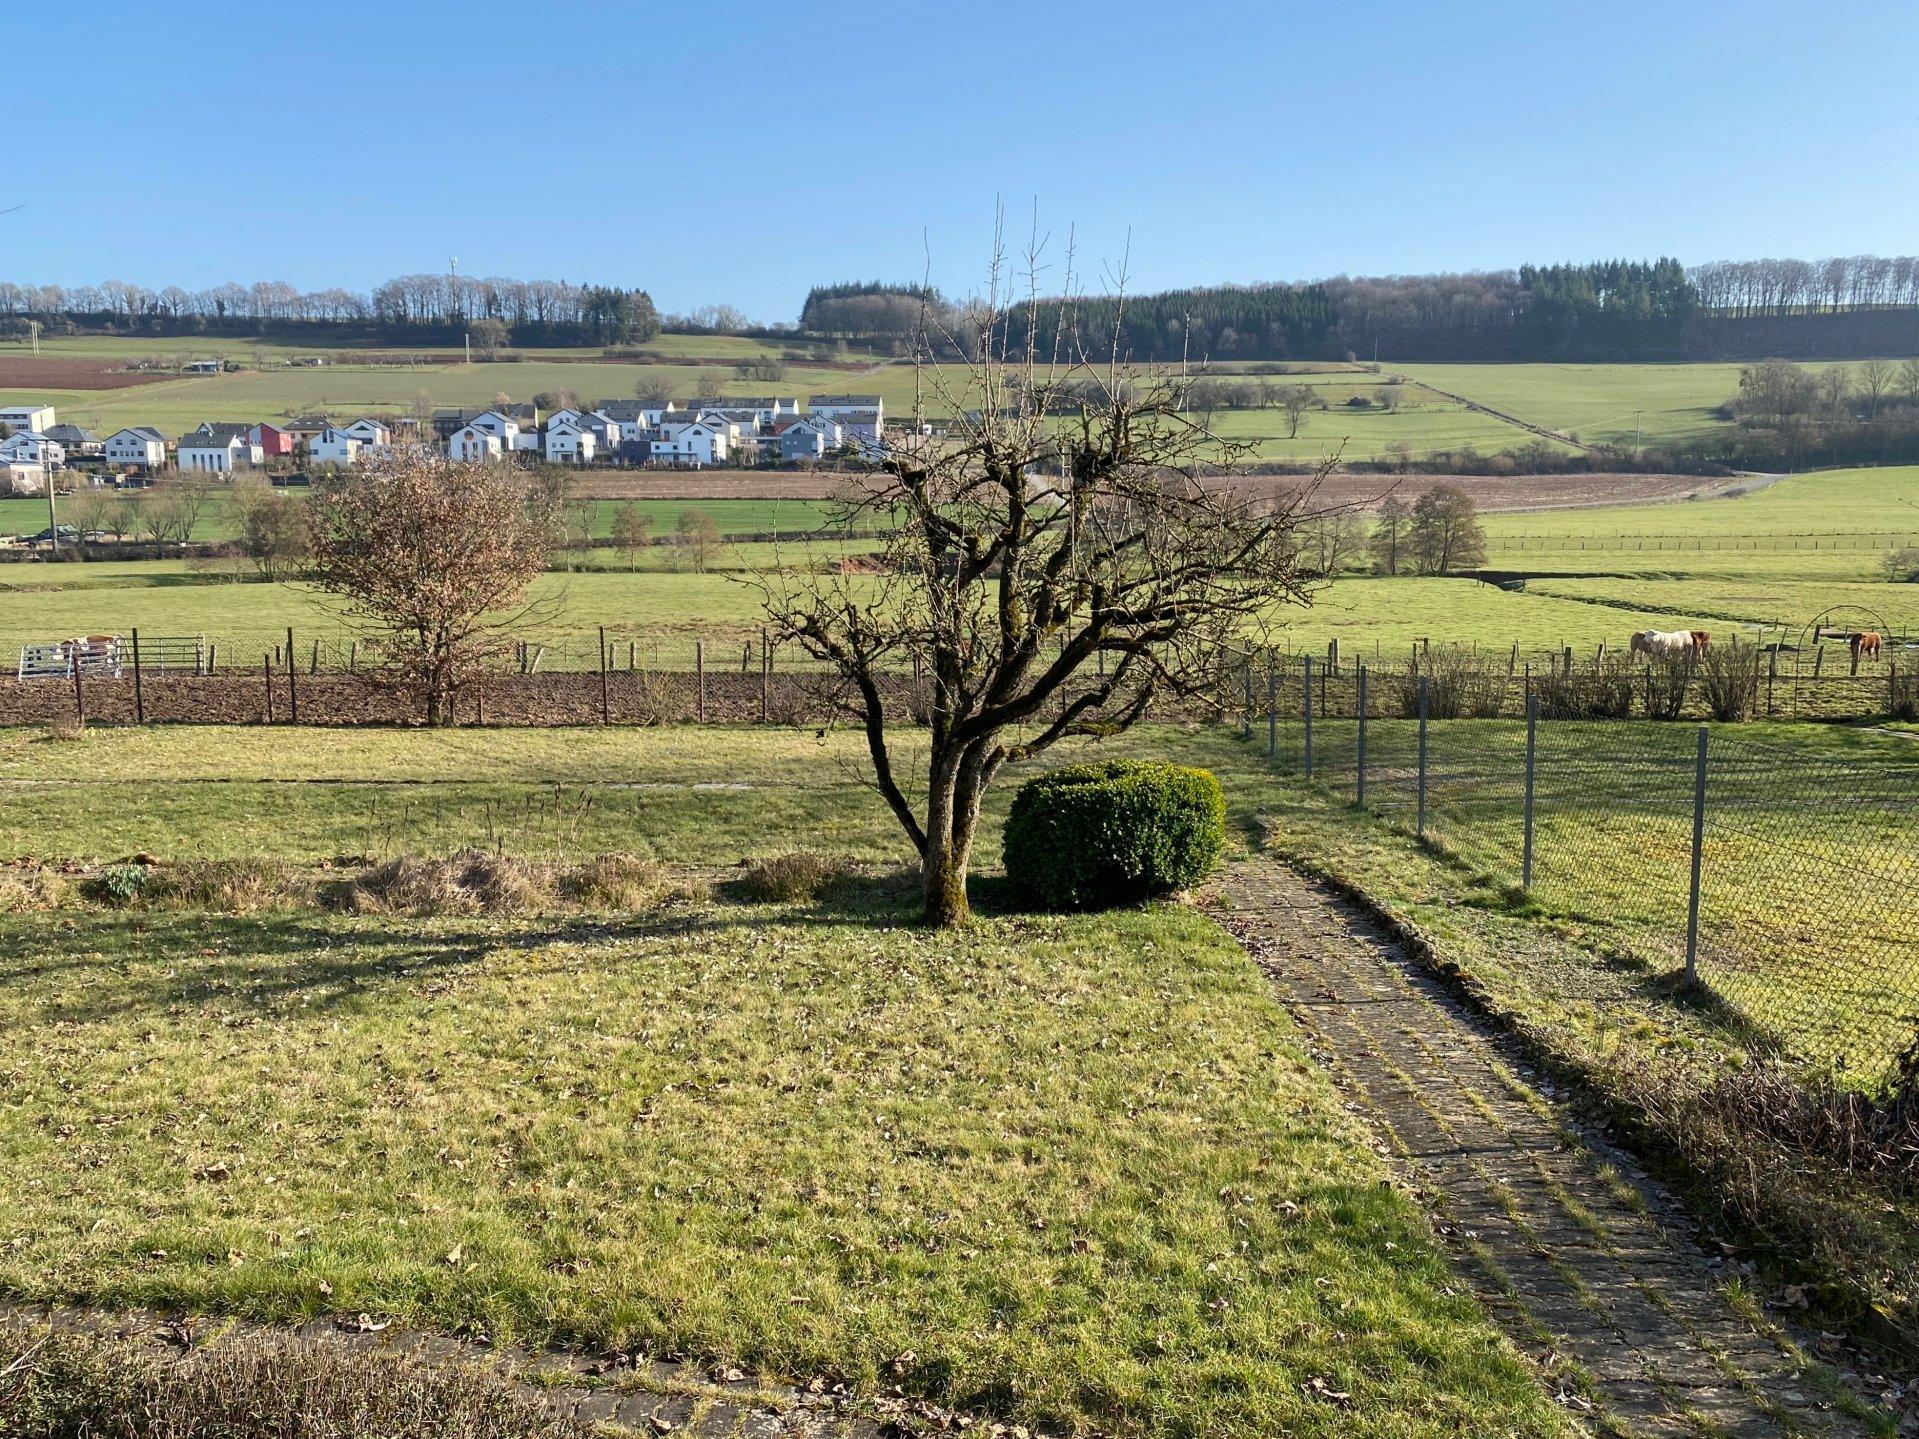 Vente Maison - Niederfeulen - Luxembourg